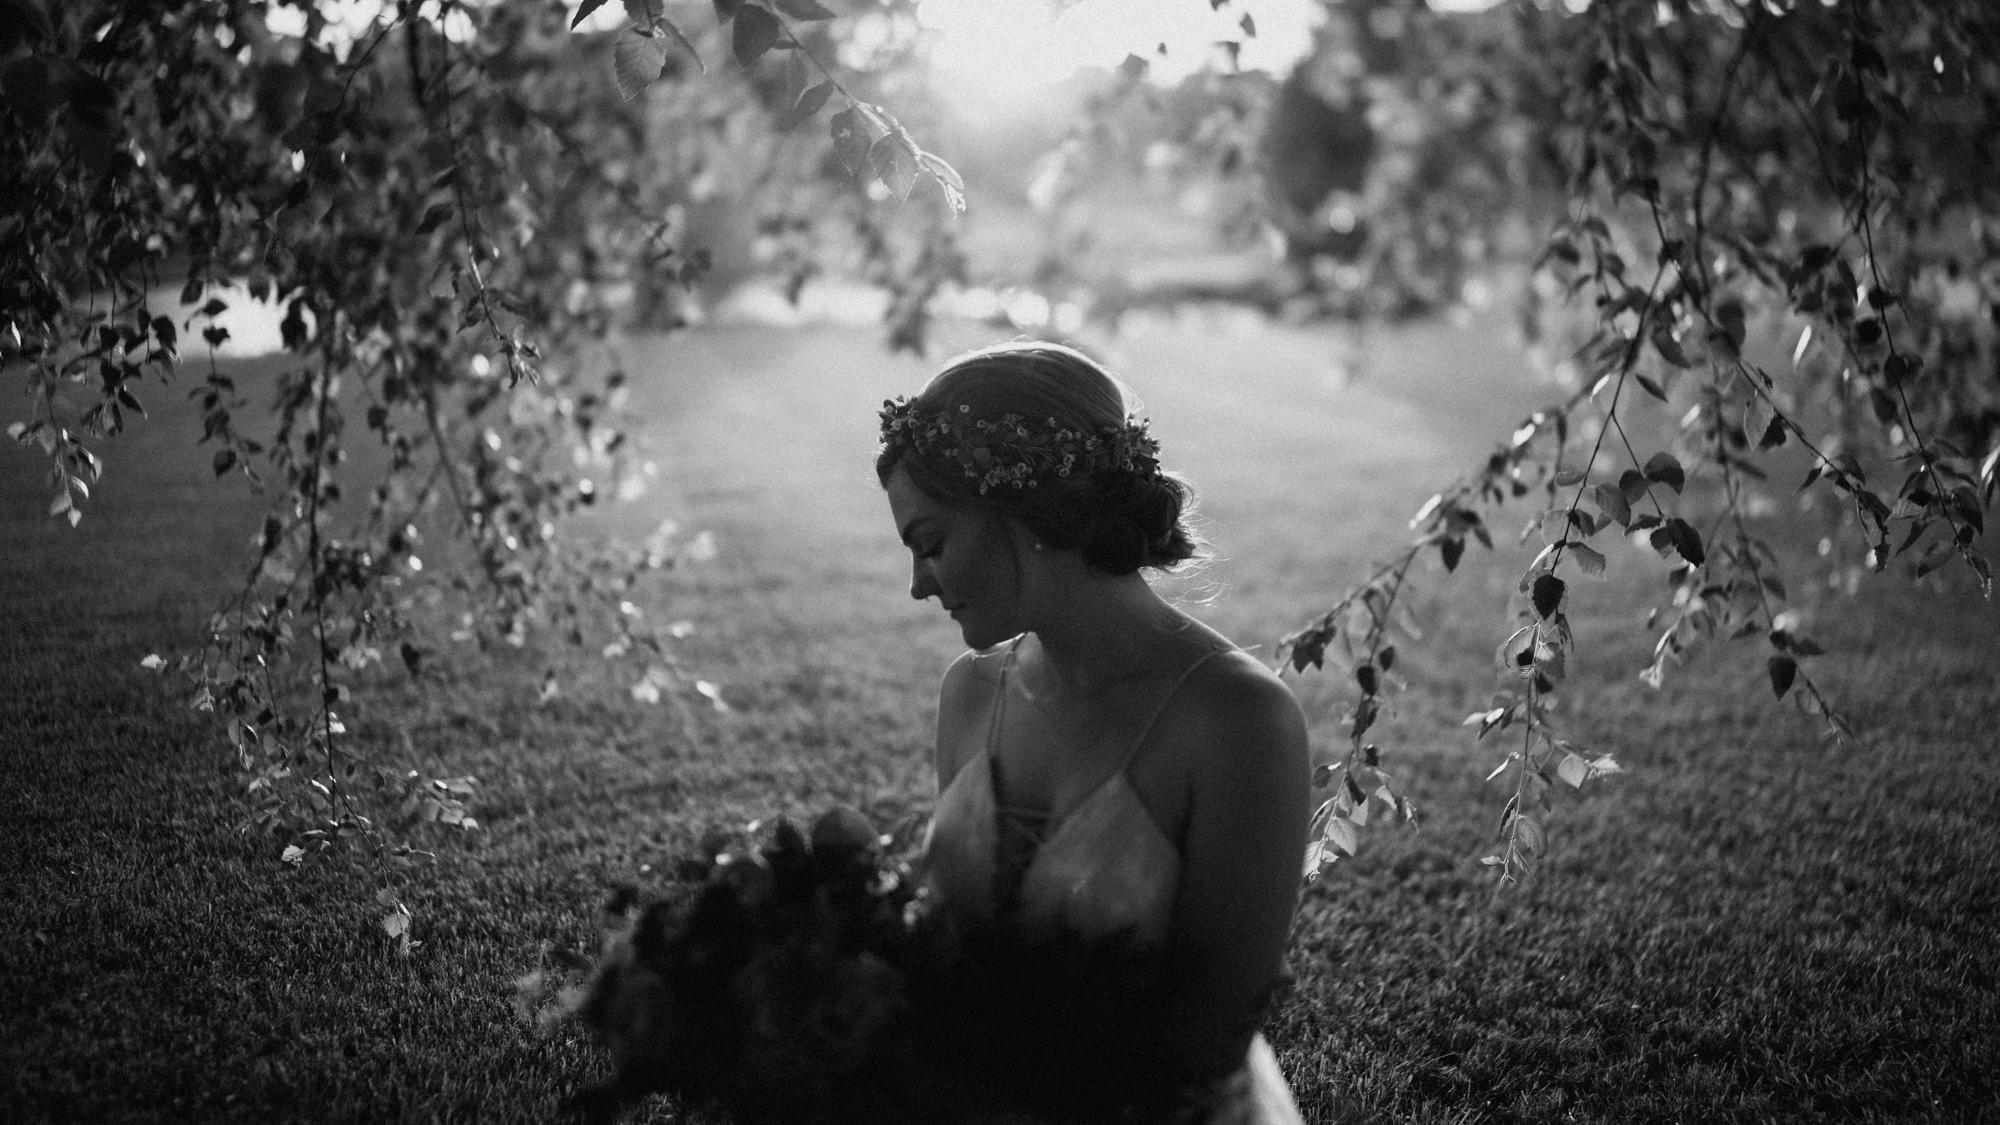 alec_vanderboom_kansas_city_mo_wedding_photos-0064.jpg